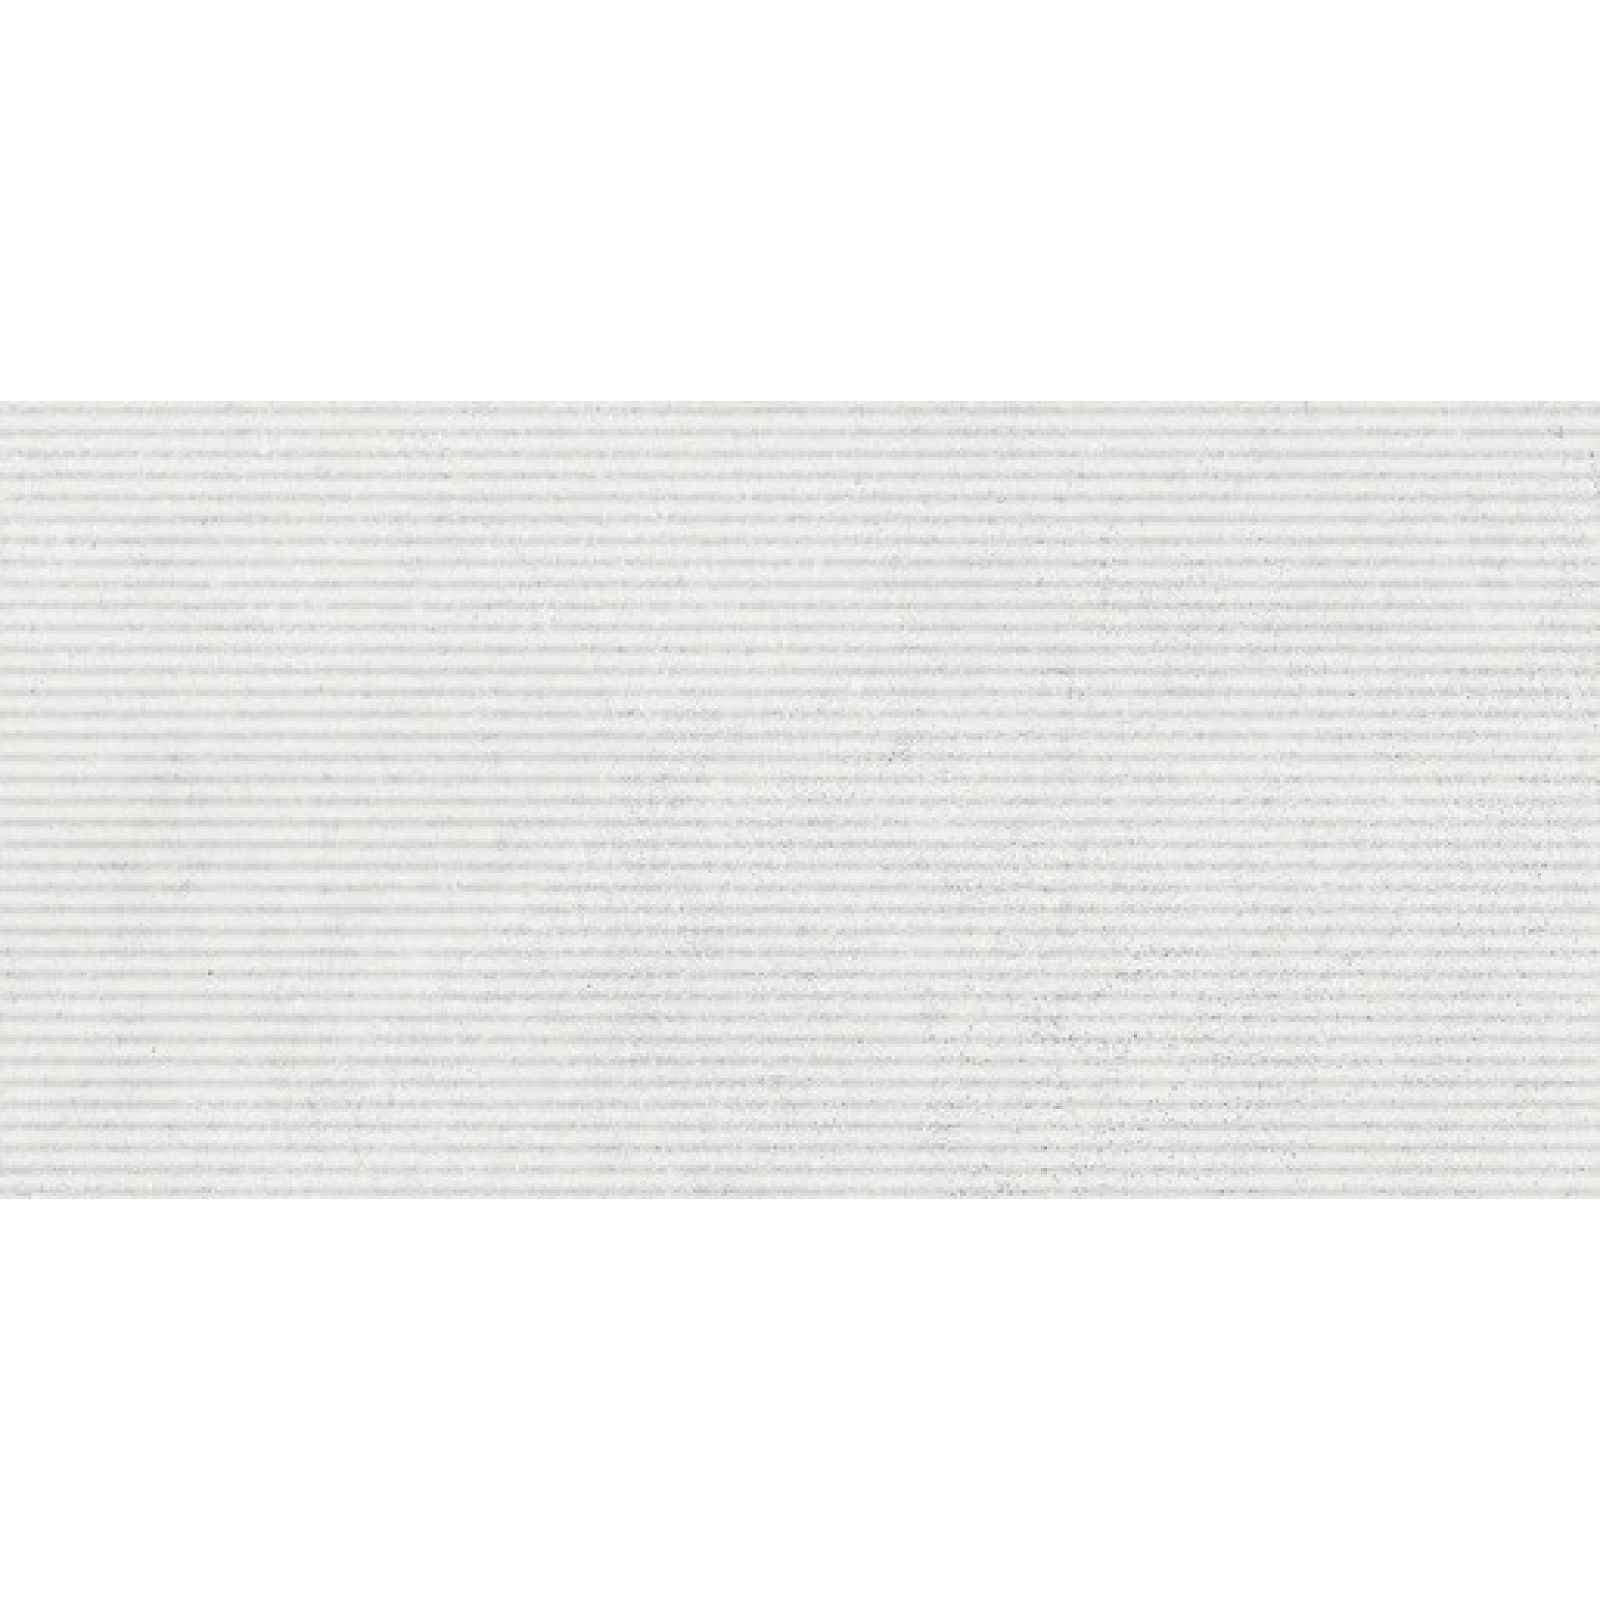 Dekor RAKO Form Plus šedá 20x40 cm mat WARMB696.1